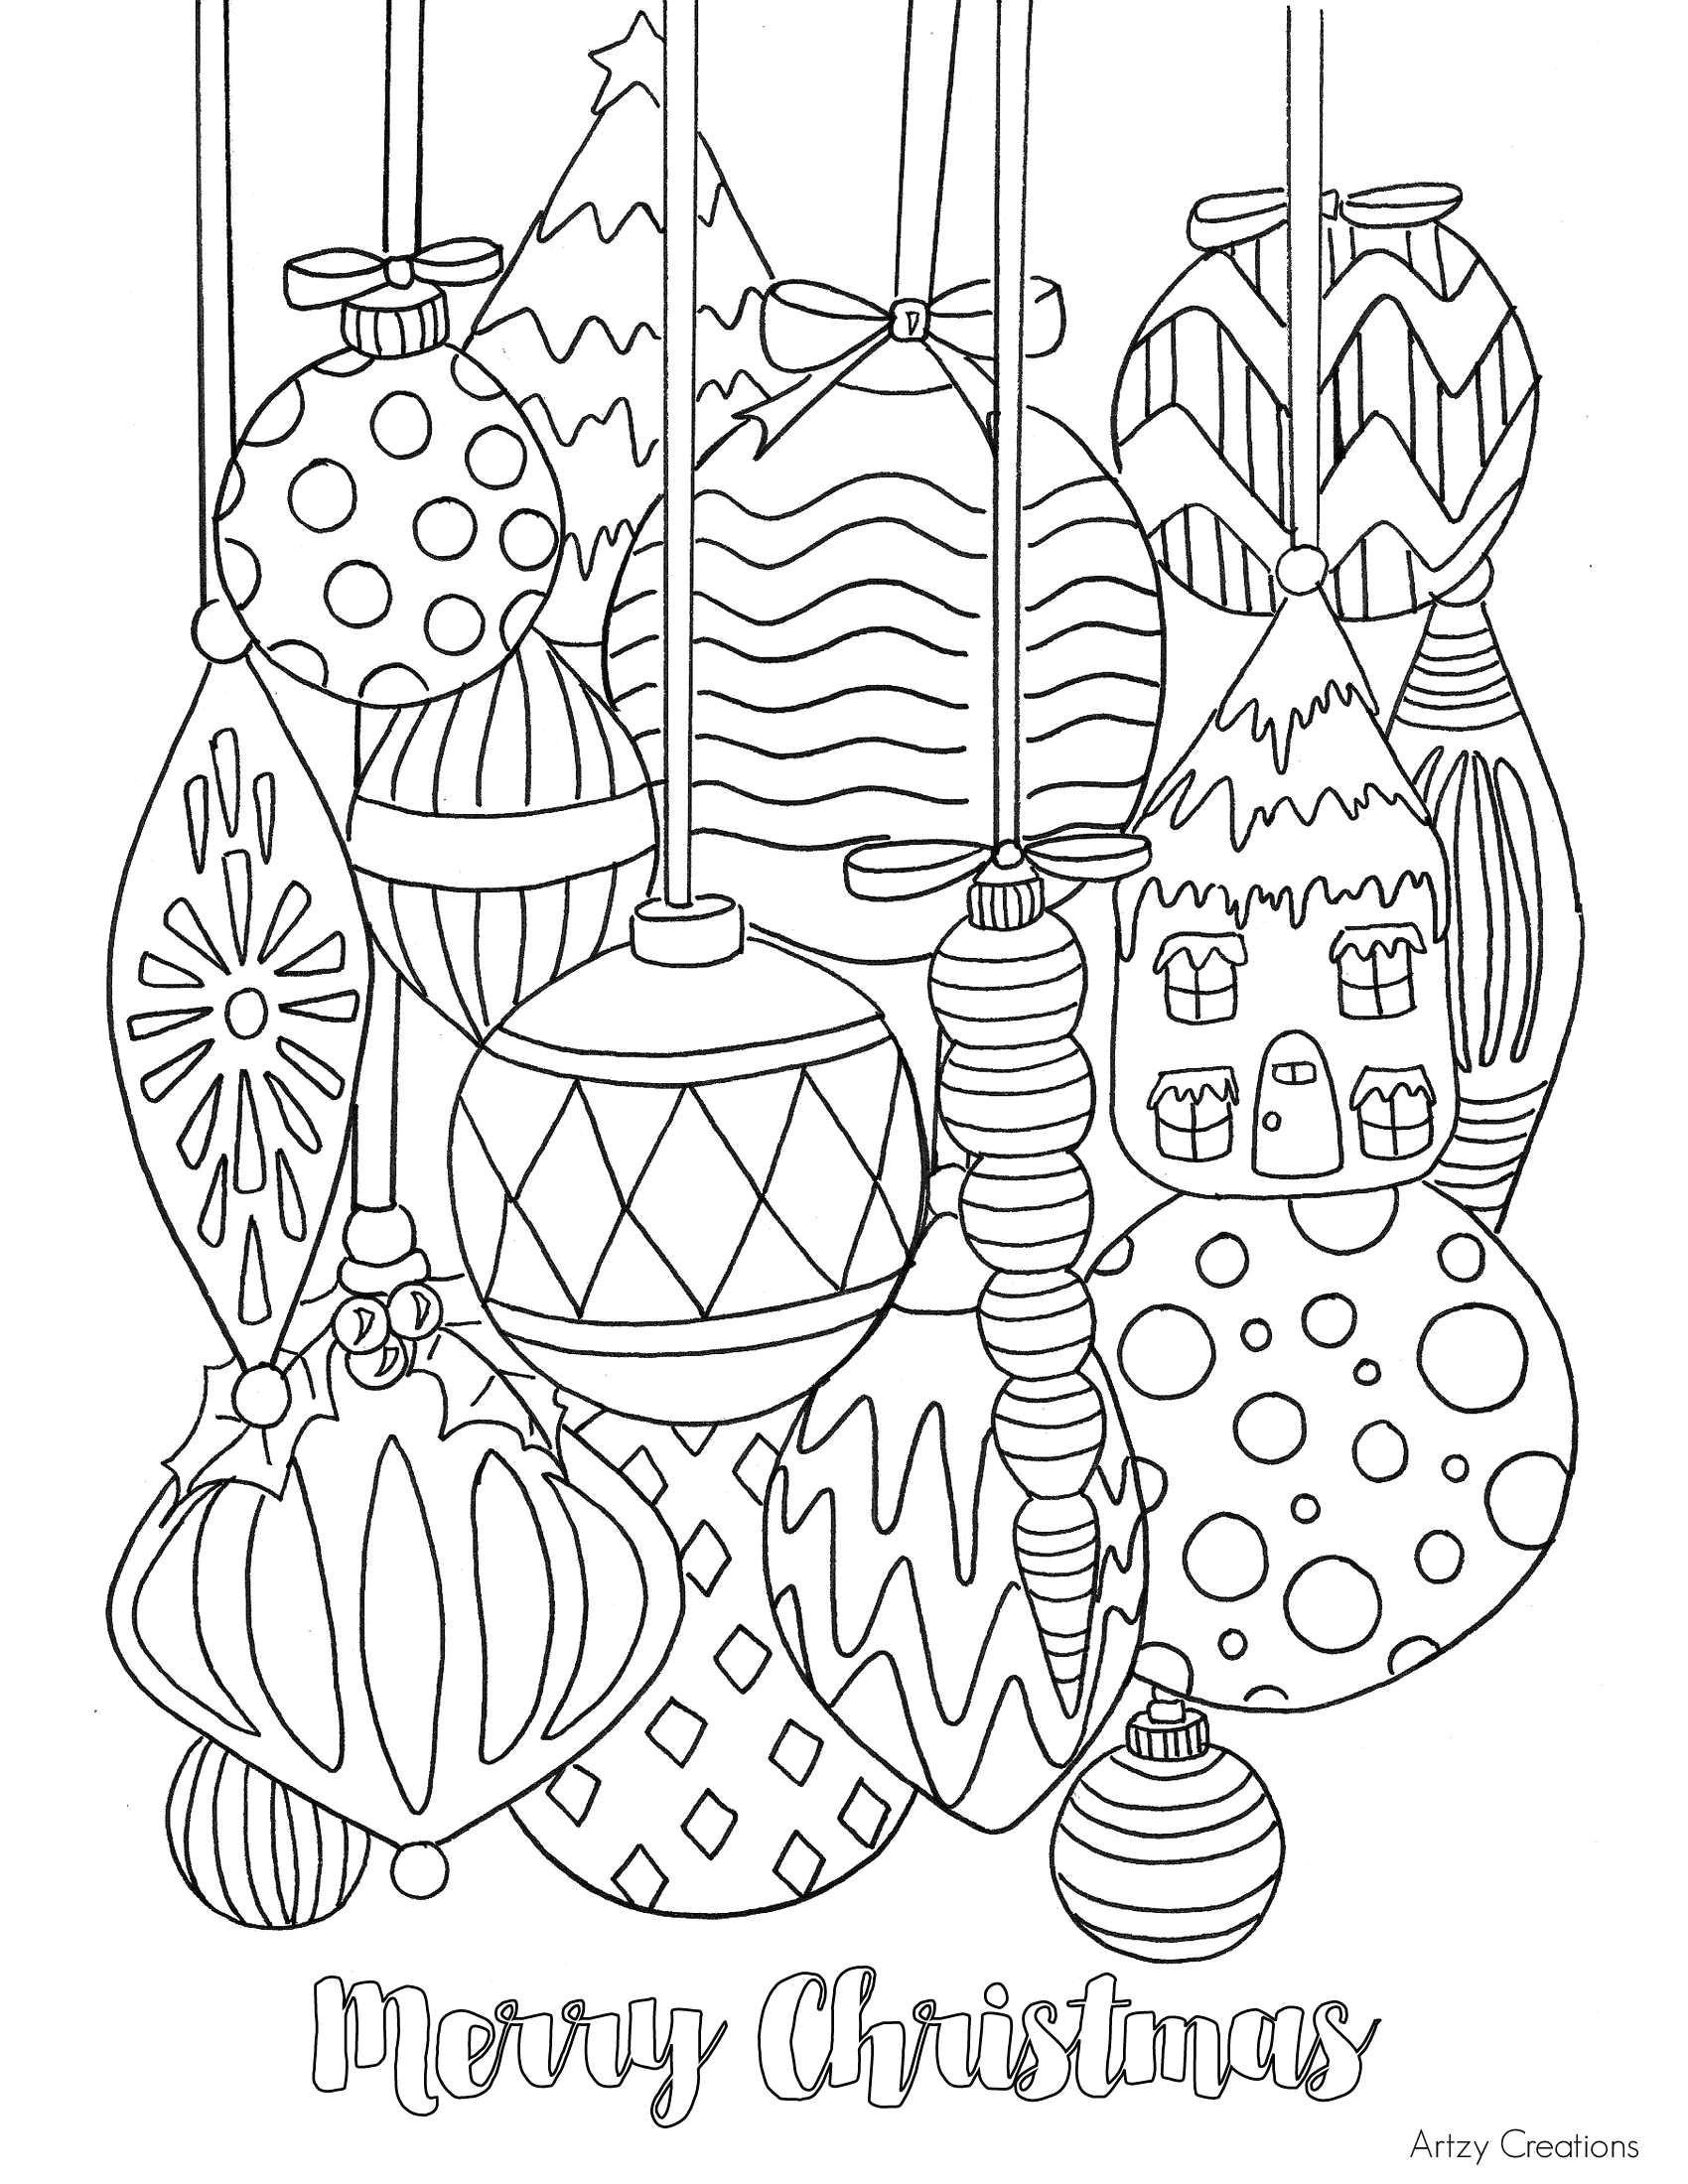 coloring websites for kids fresh socks coloring page luxury kid coloring pages draw coloring pages photos